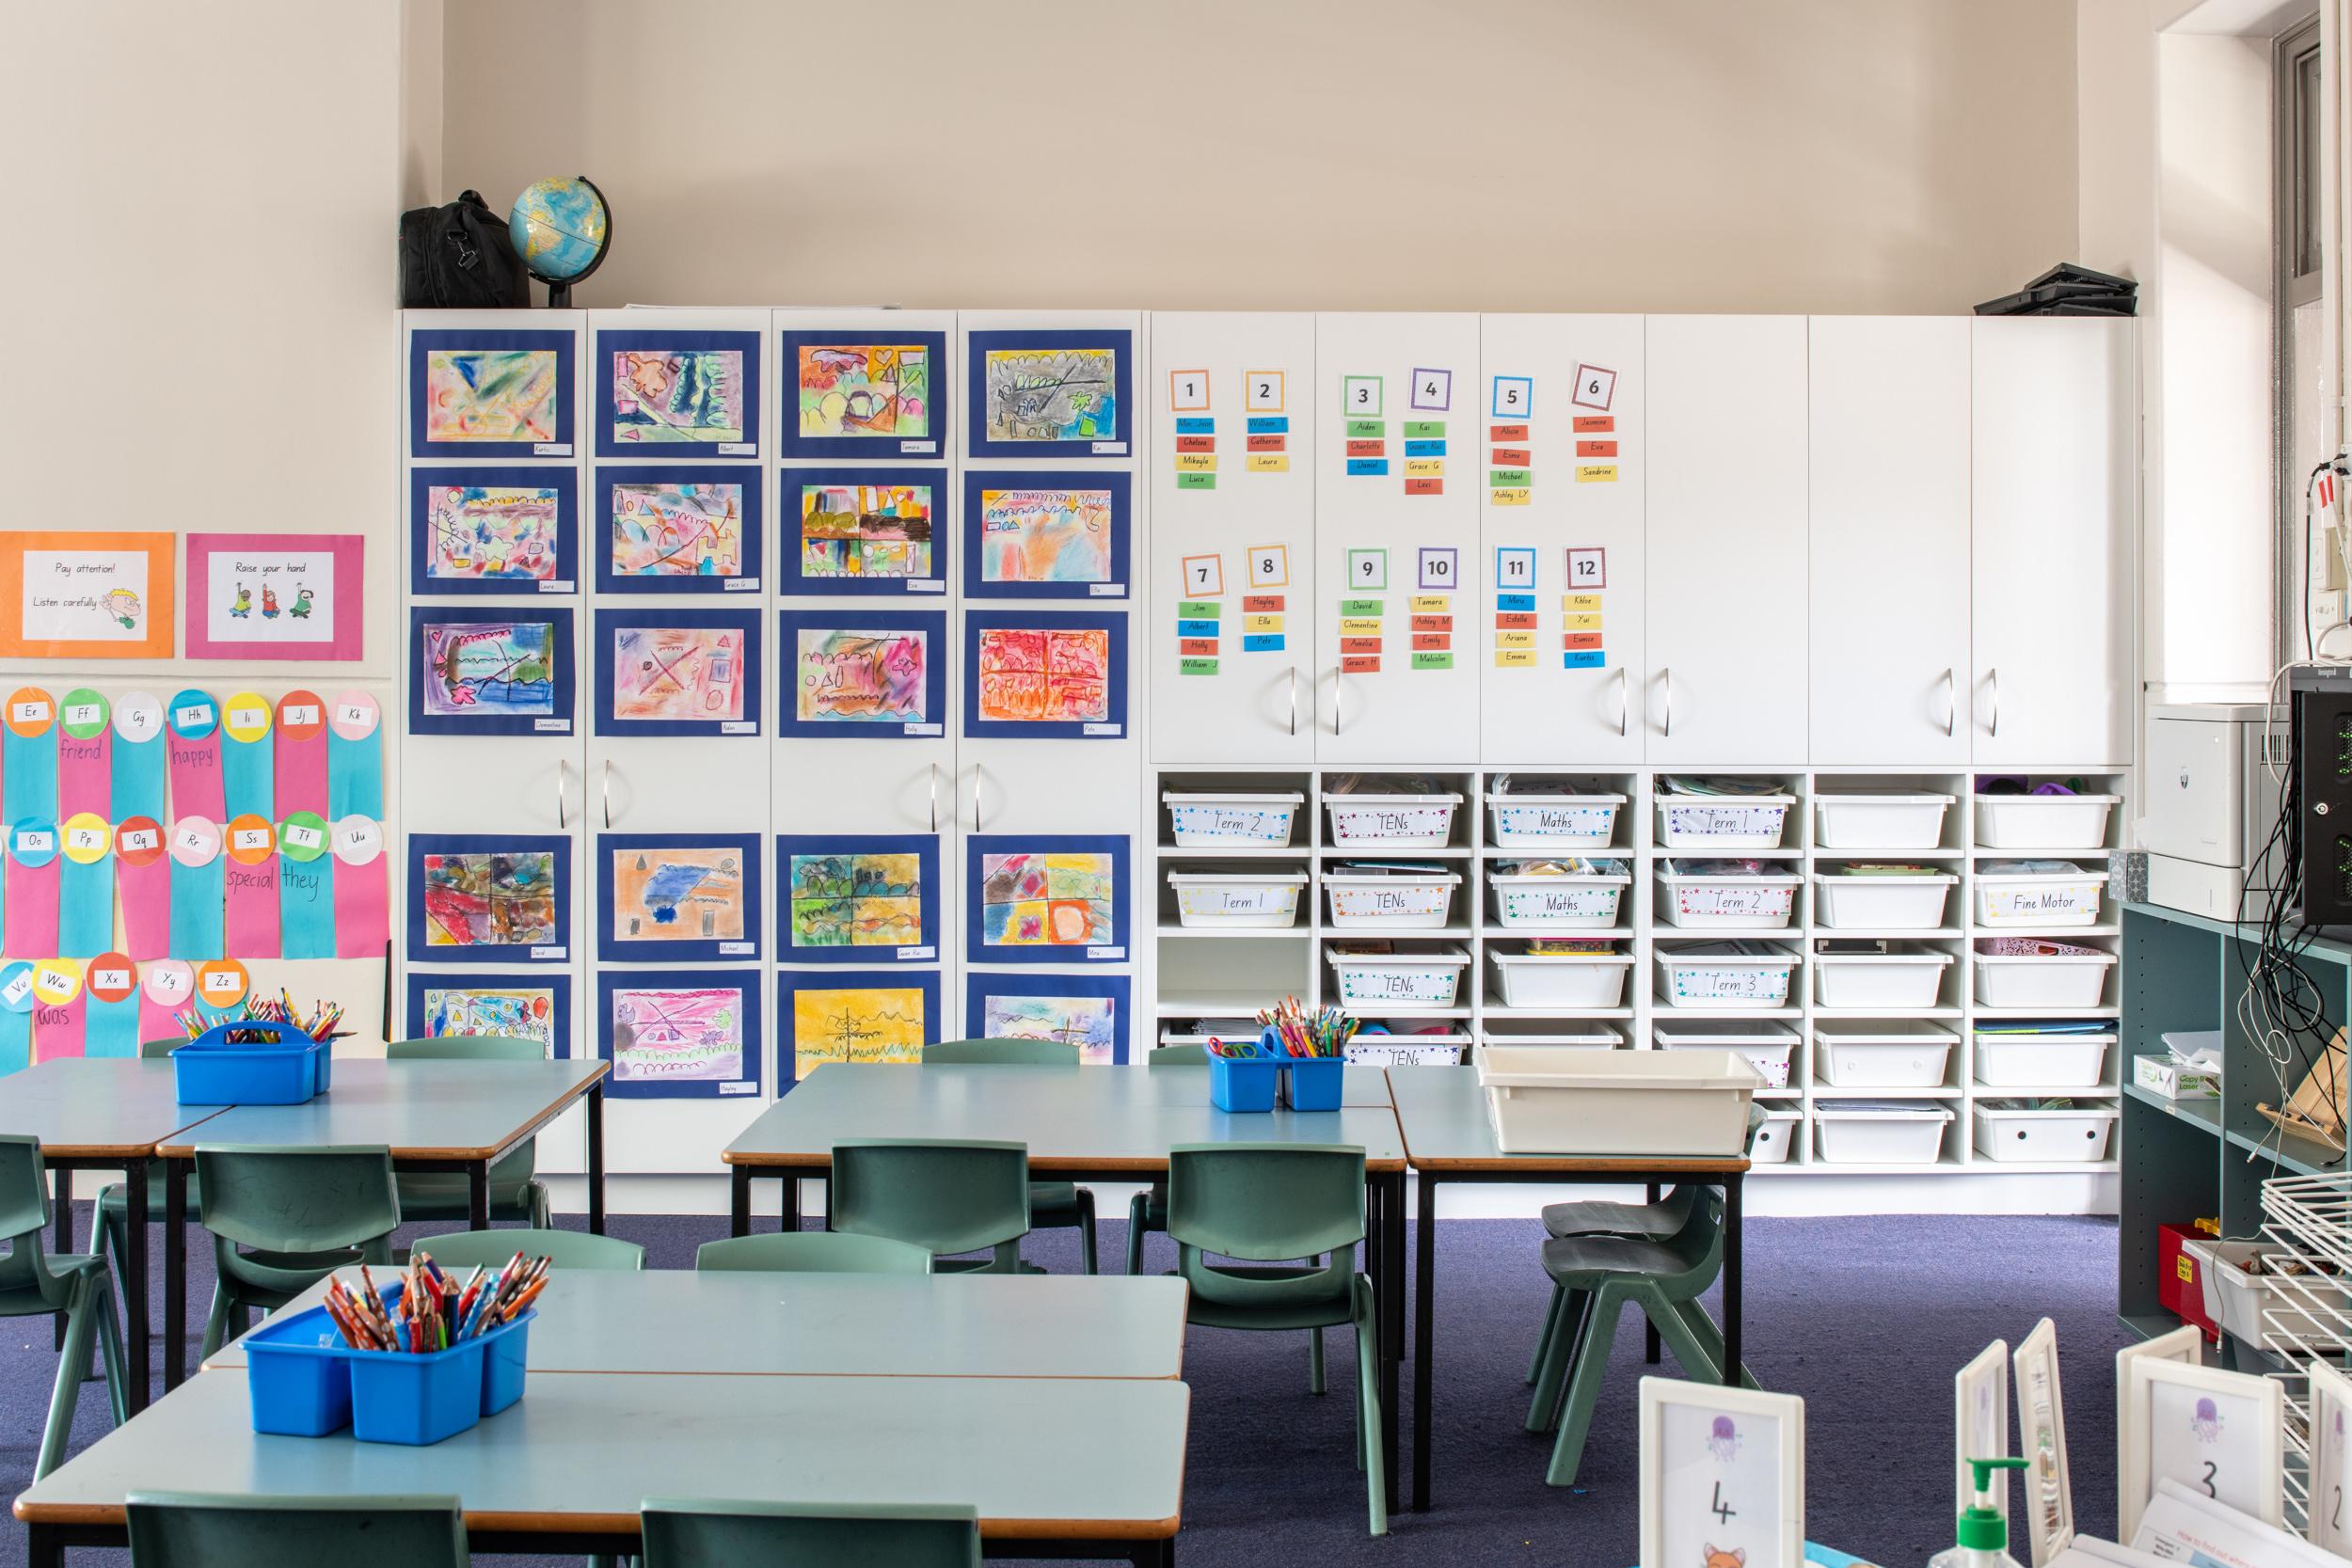 Chatswood Public School LR 9 4